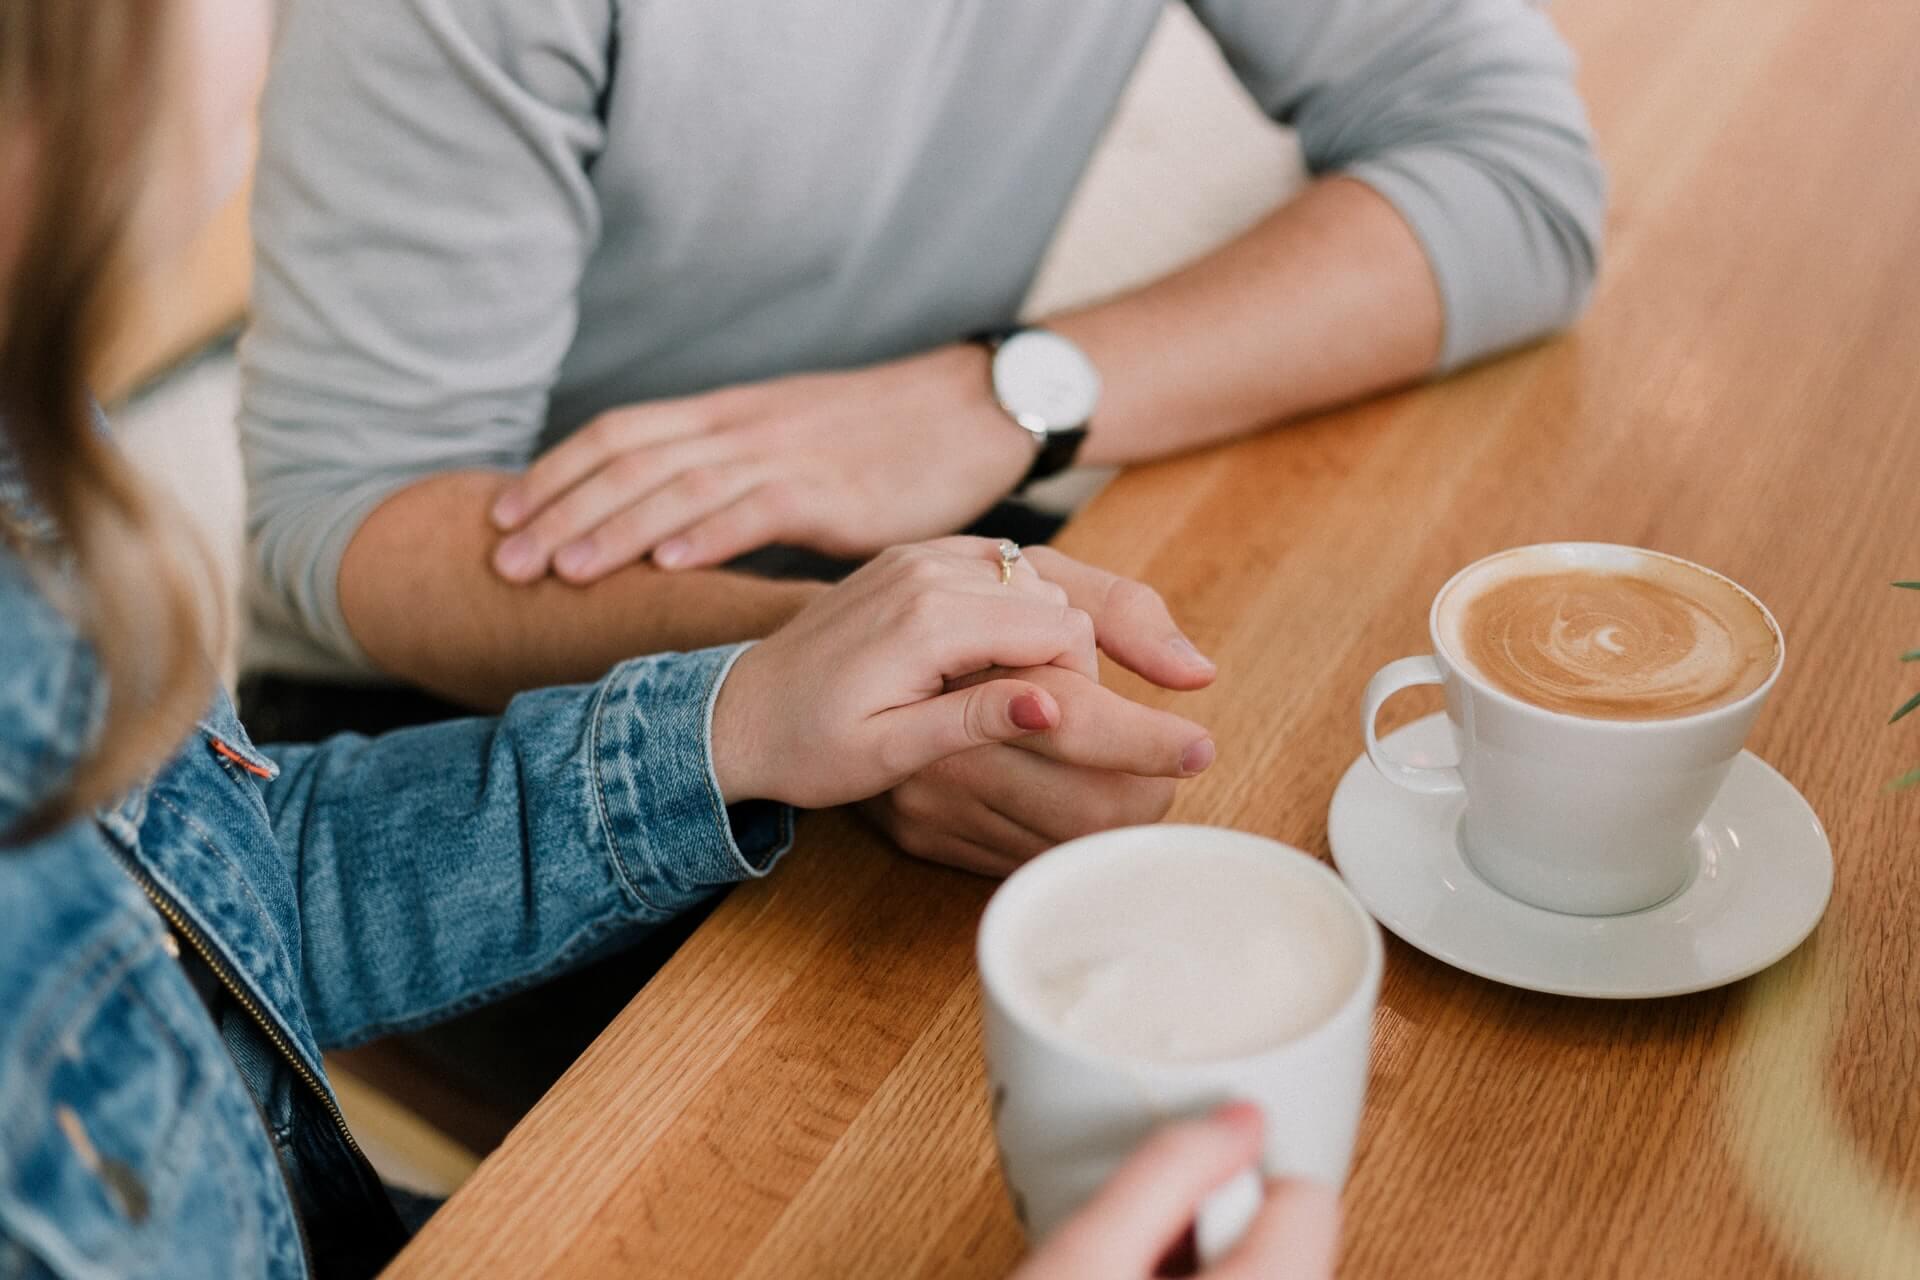 Pareja conversando mientras toman café.